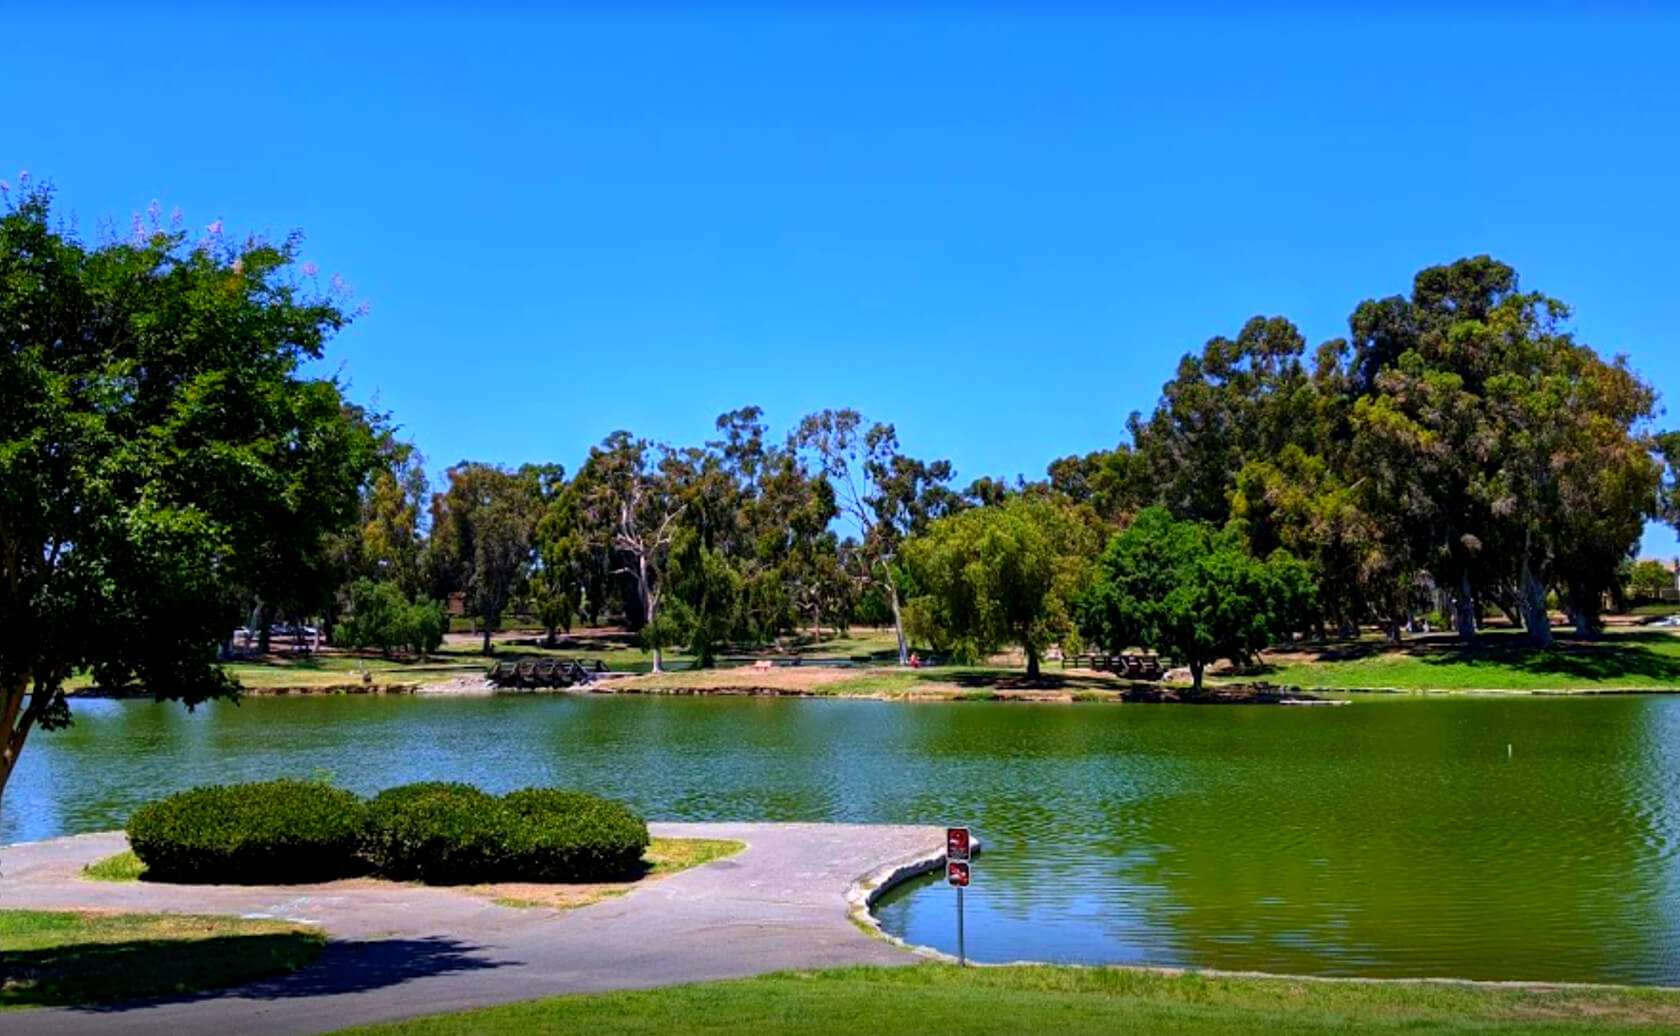 Tri-City-Park-Lake-Fishing-Guide-Report-Placentia-CA-01